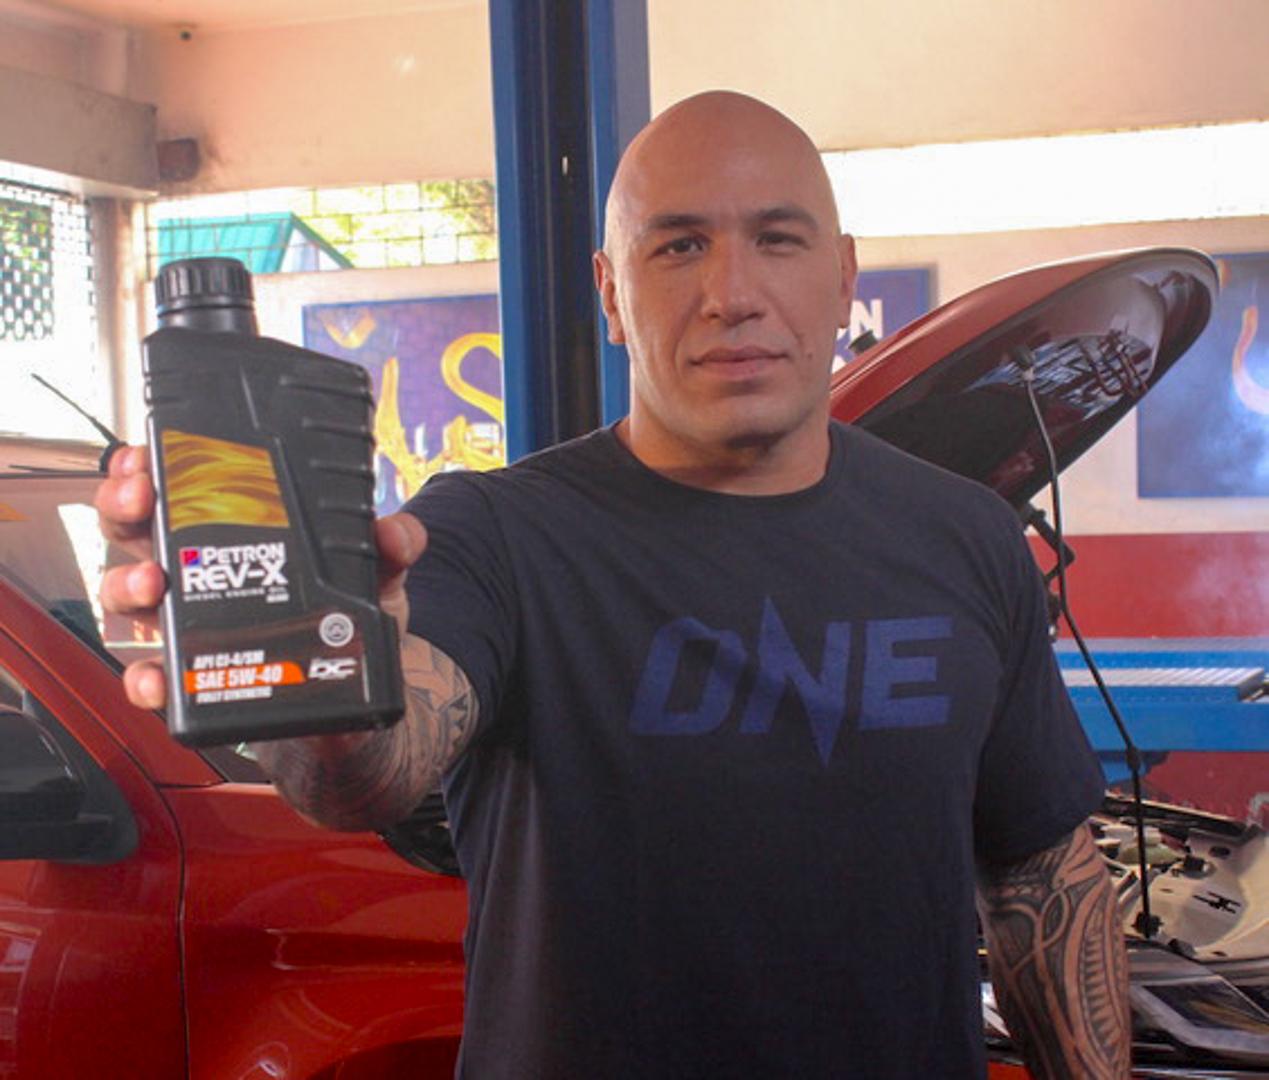 Brandon Vera Trusts Petron Rev-X Diesel Engine Oil